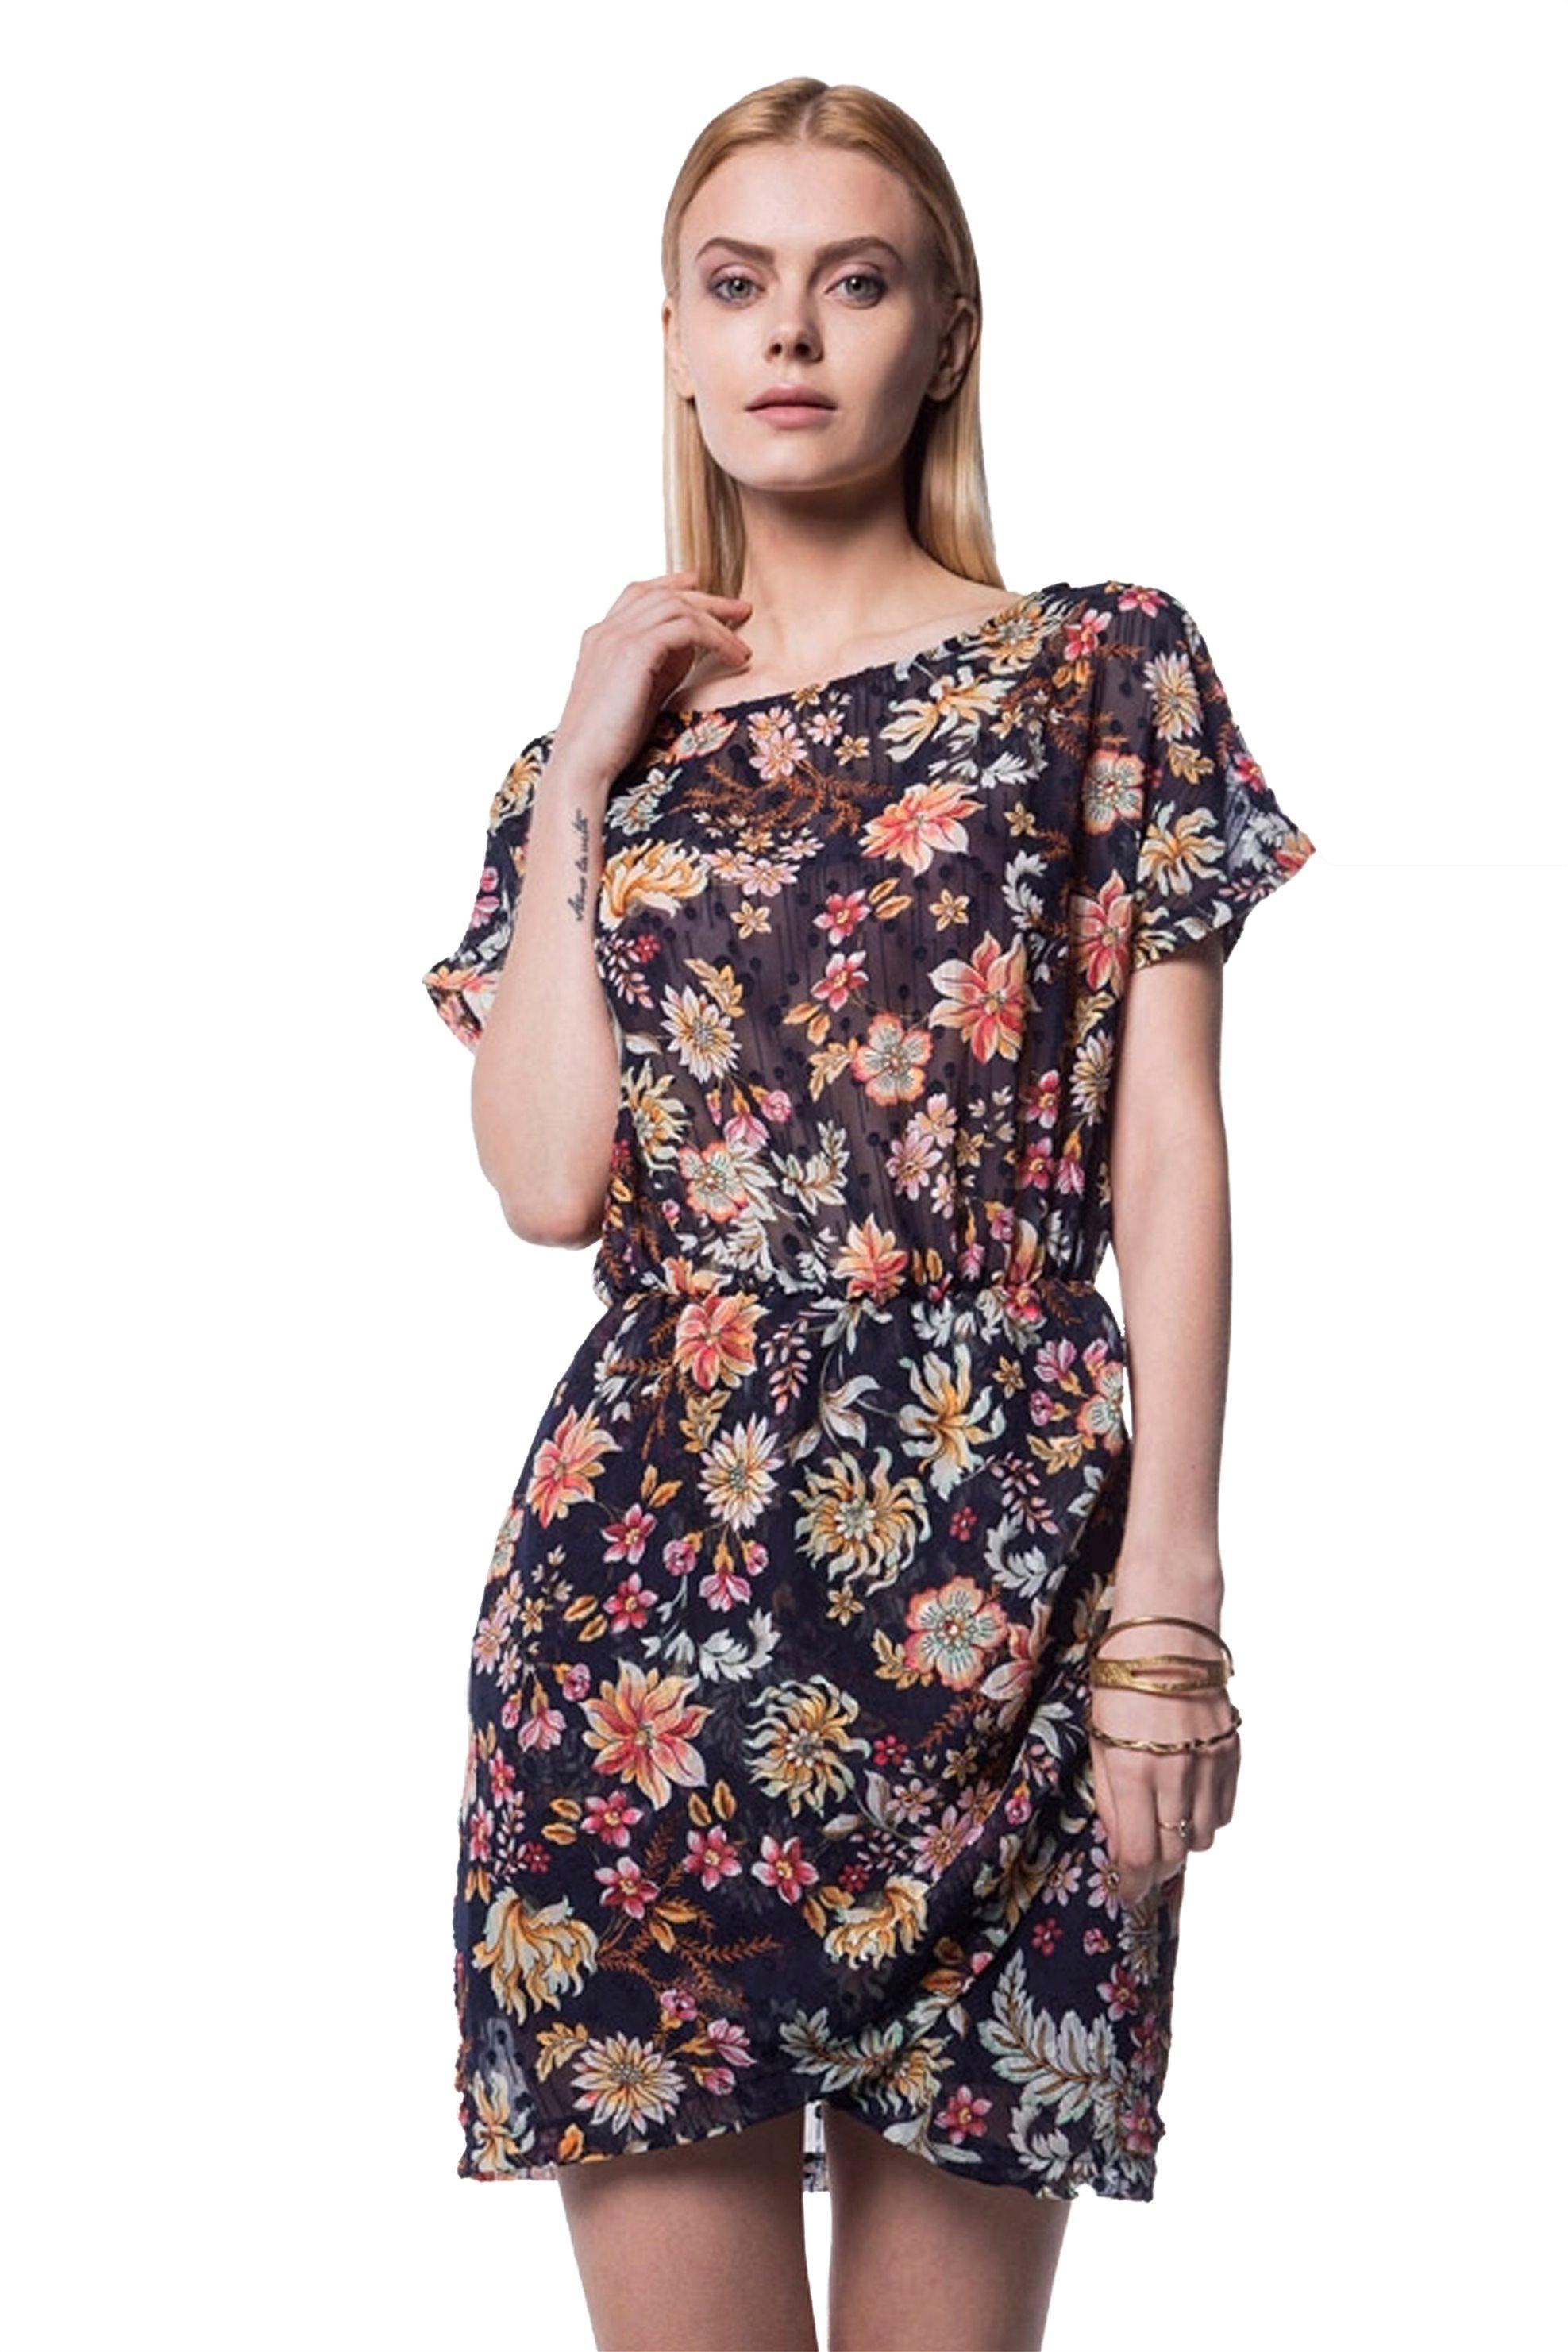 76f25f32285f Γυναικεία   Ρούχα   Φορέματα   Καθημερινά   41552 FS Βραδινό ...